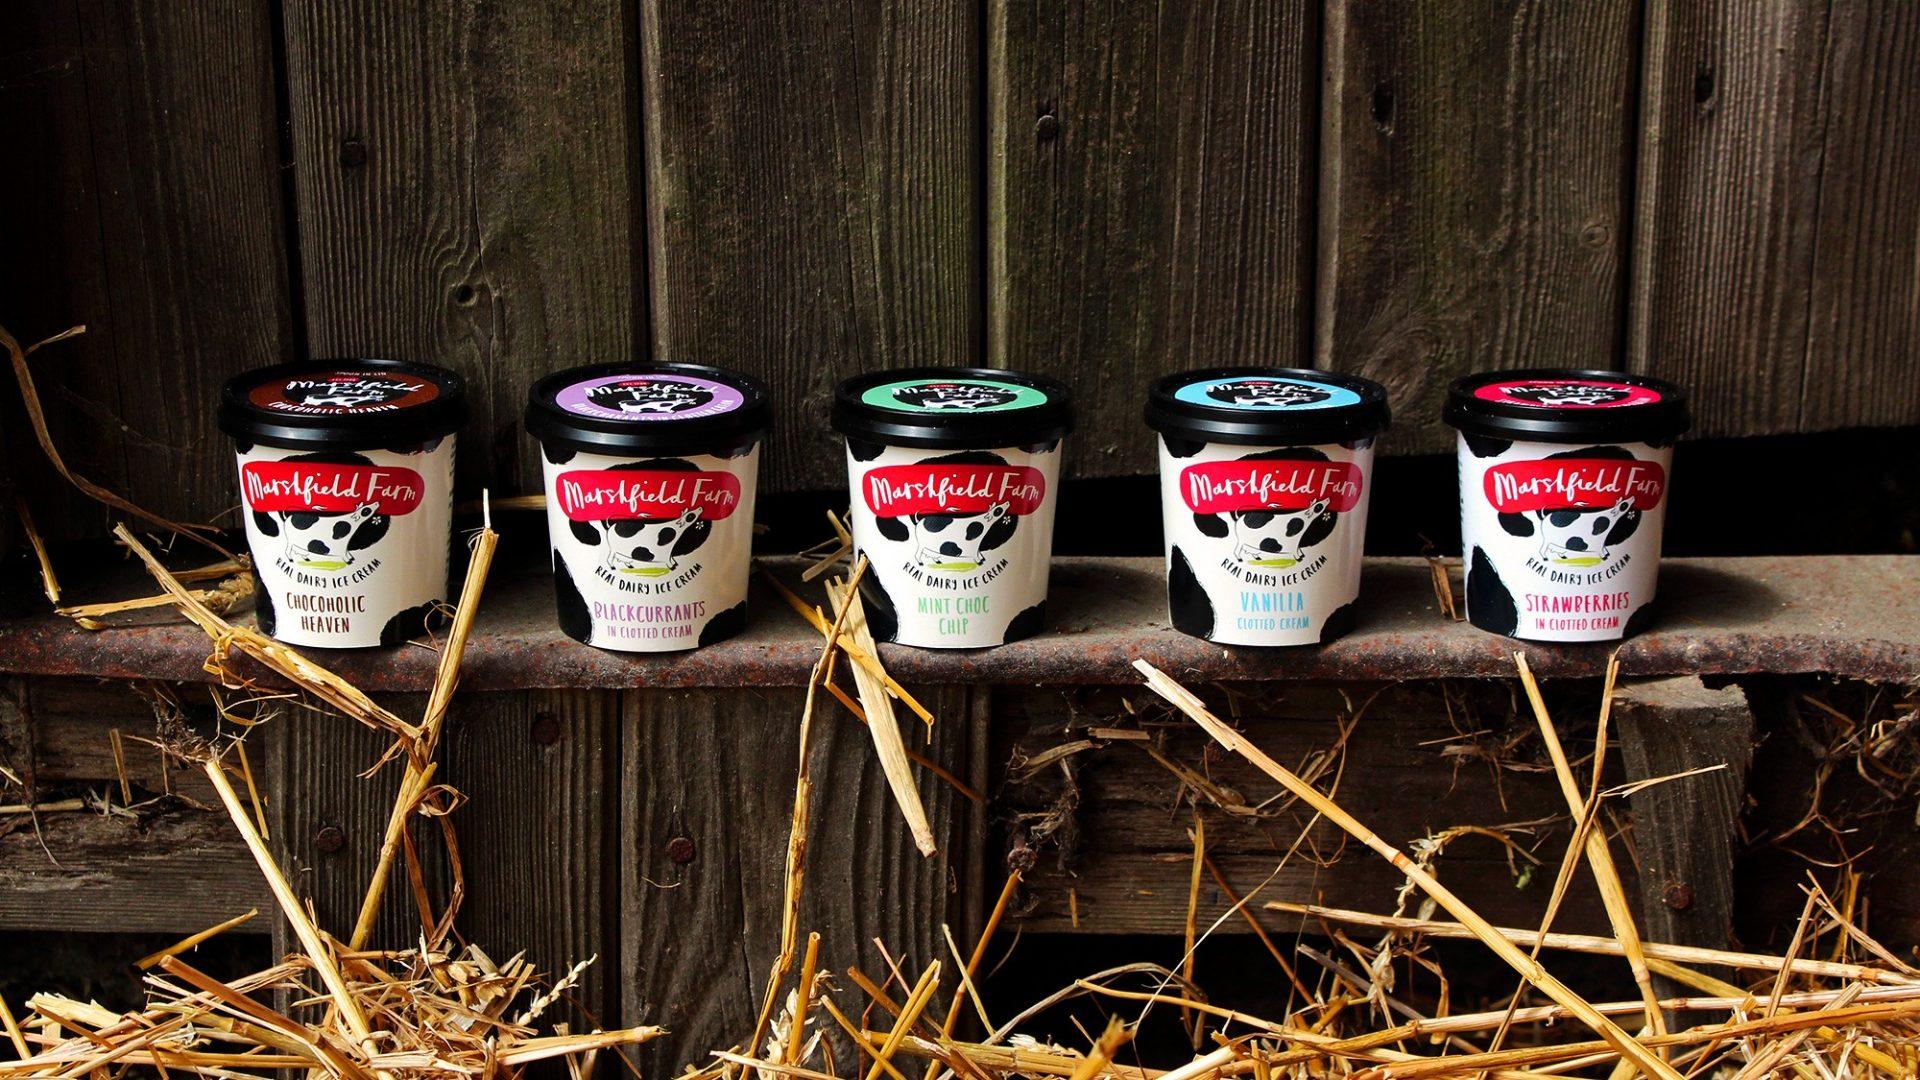 Pre-purchase ice cream vouchers!